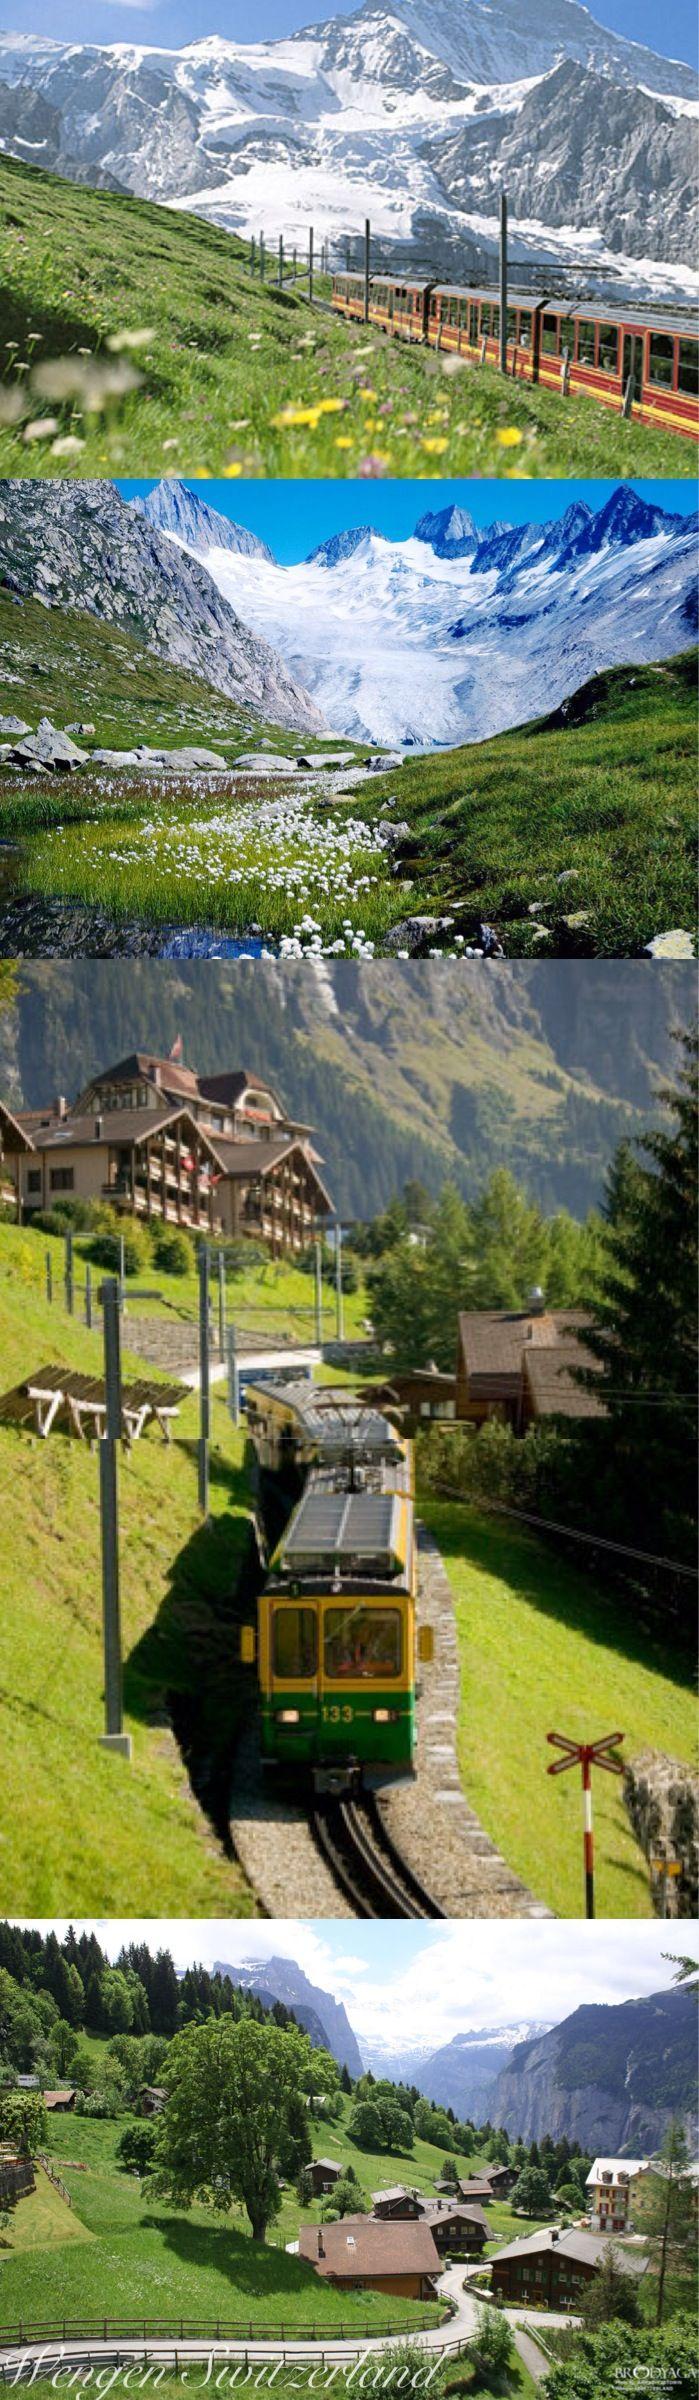 Meer dan 1000 ideeën over zwitserse alpen op pinterest ...